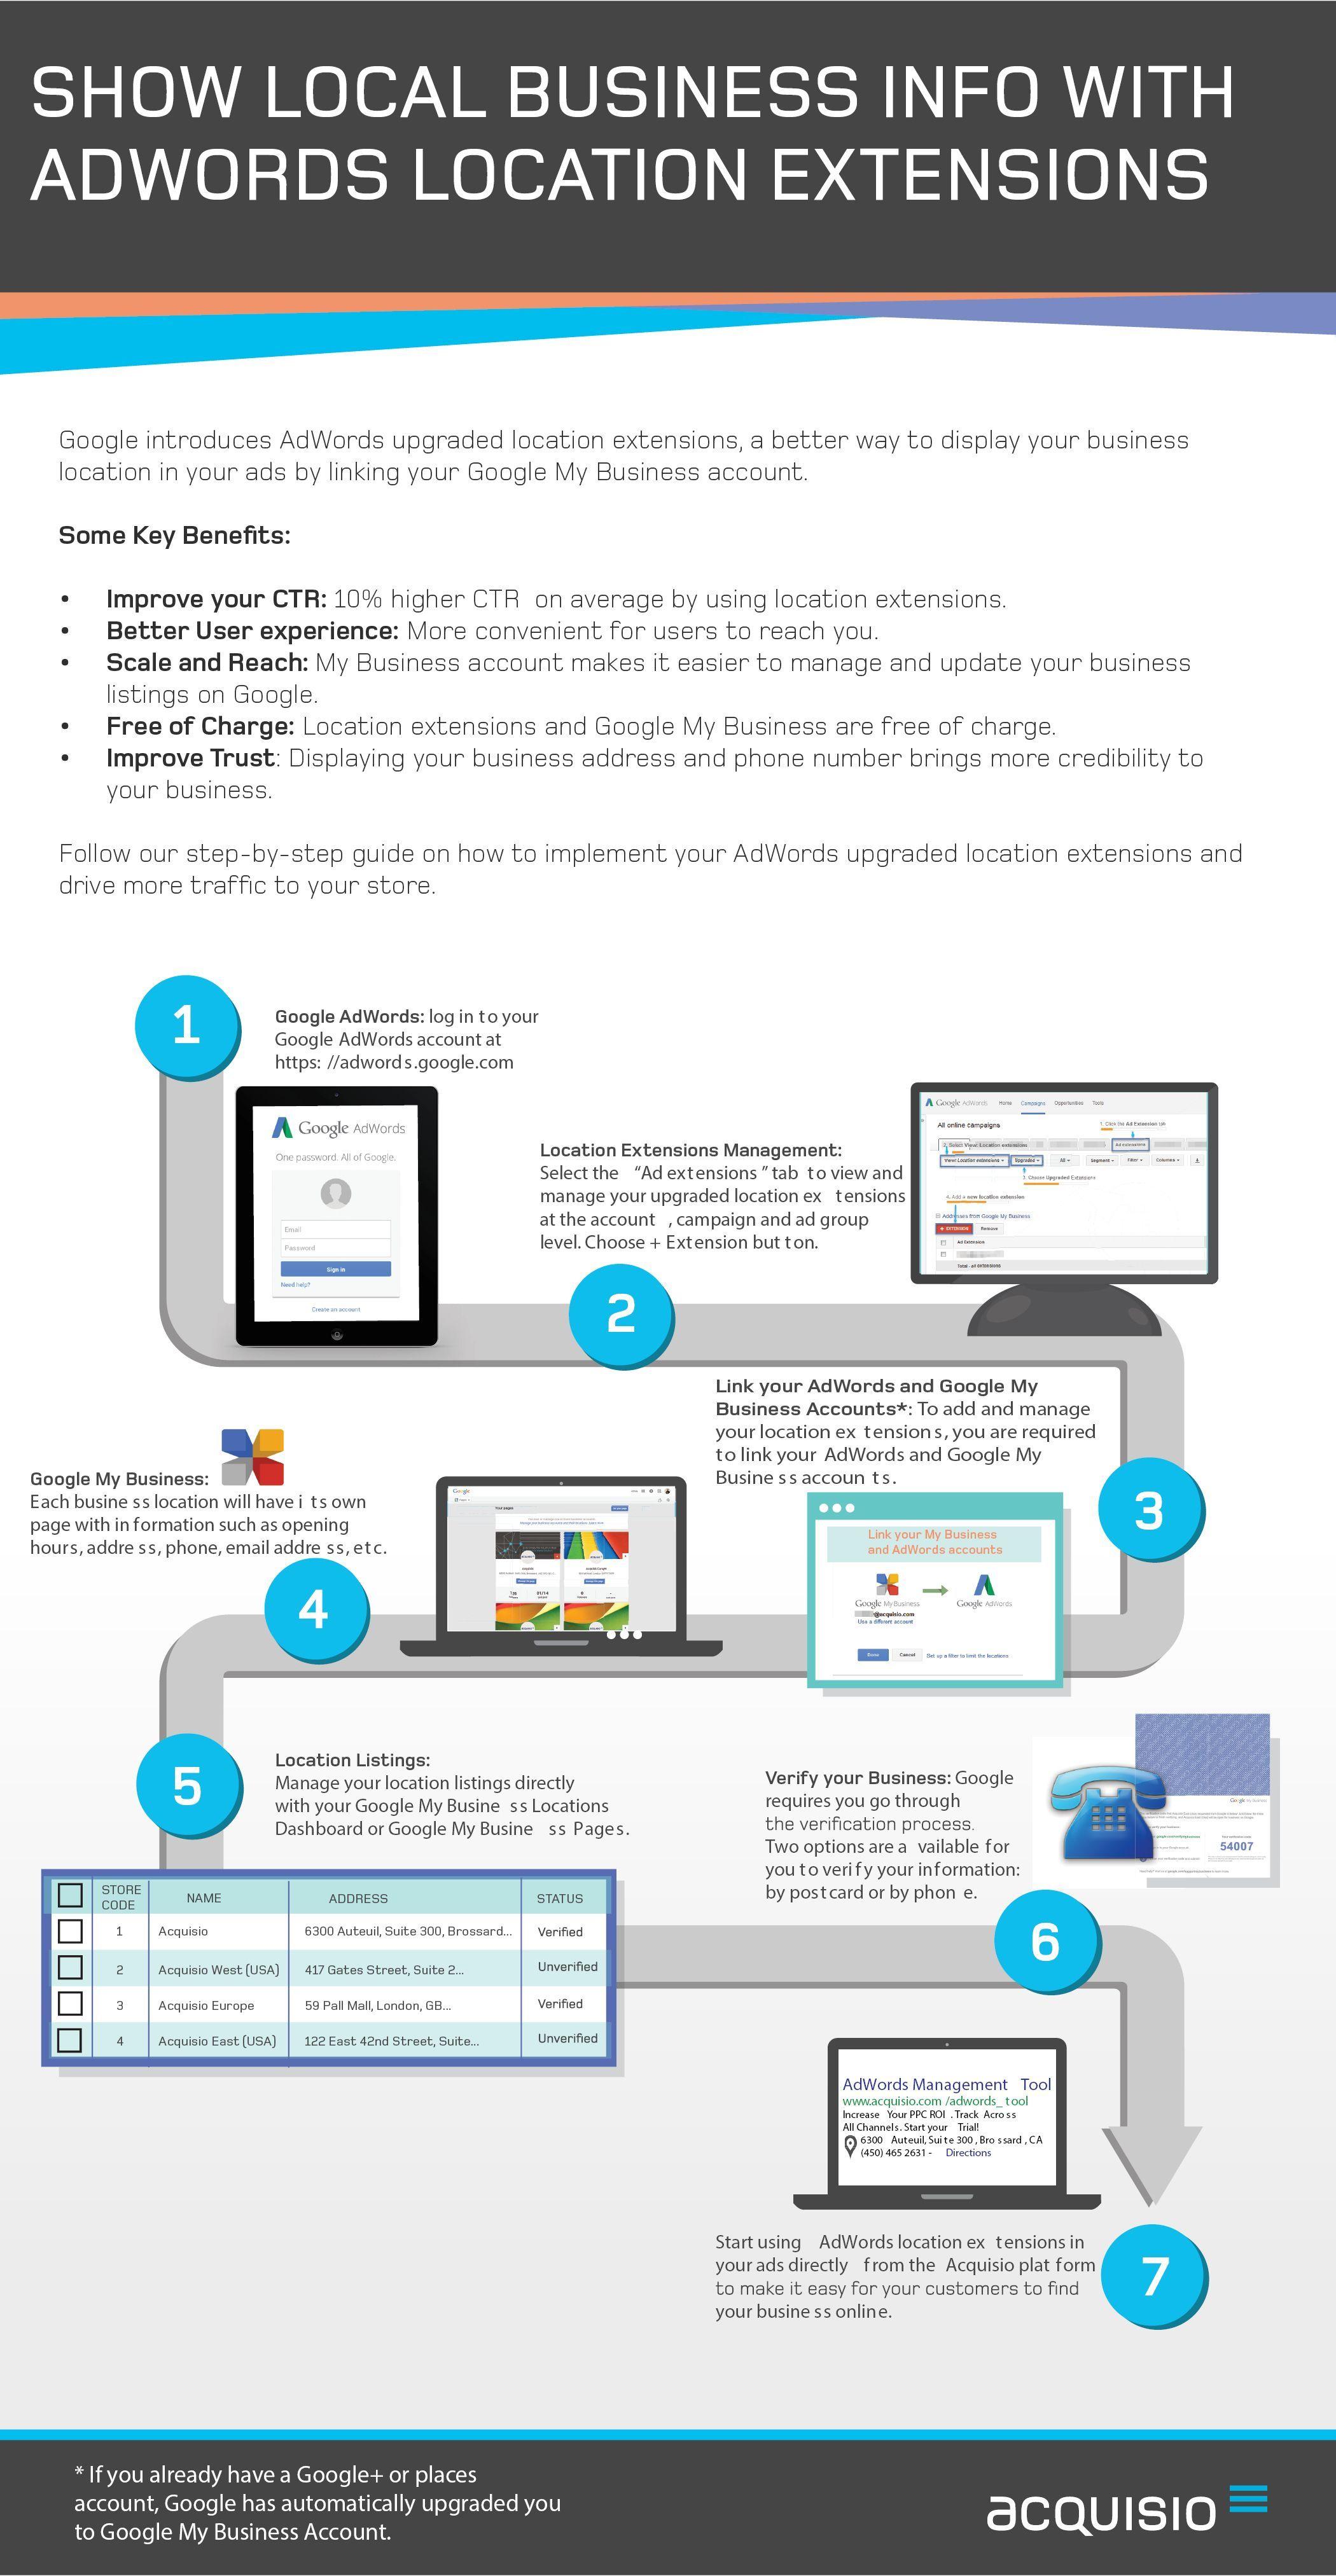 AdWords Location Extension Infographic | Acquisio | Local